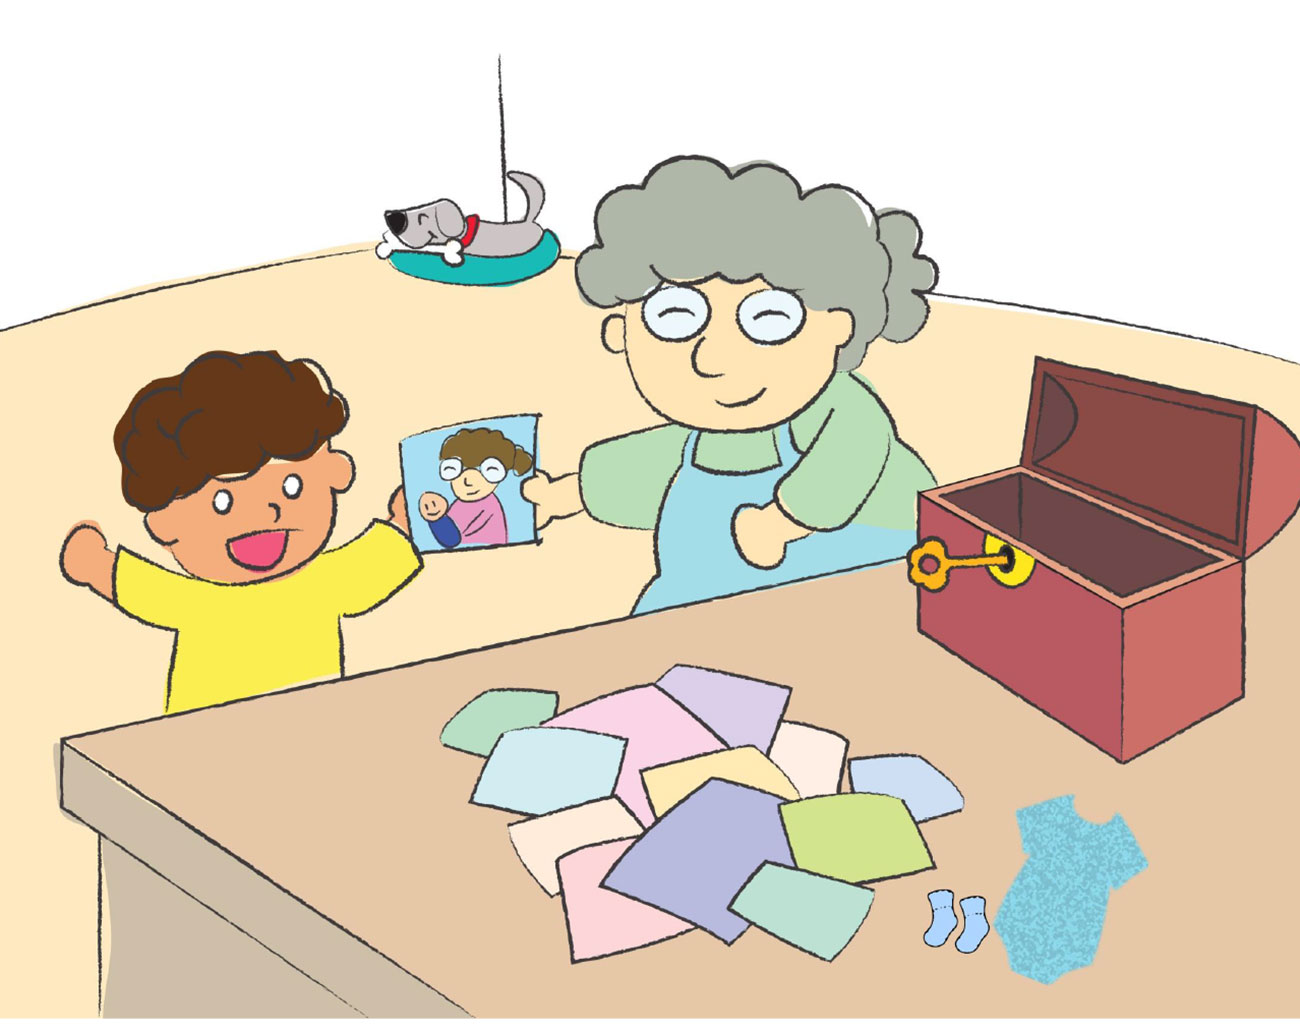 kids short story 'Down the memory lane with nash' by uma bala devarakonda - page 15